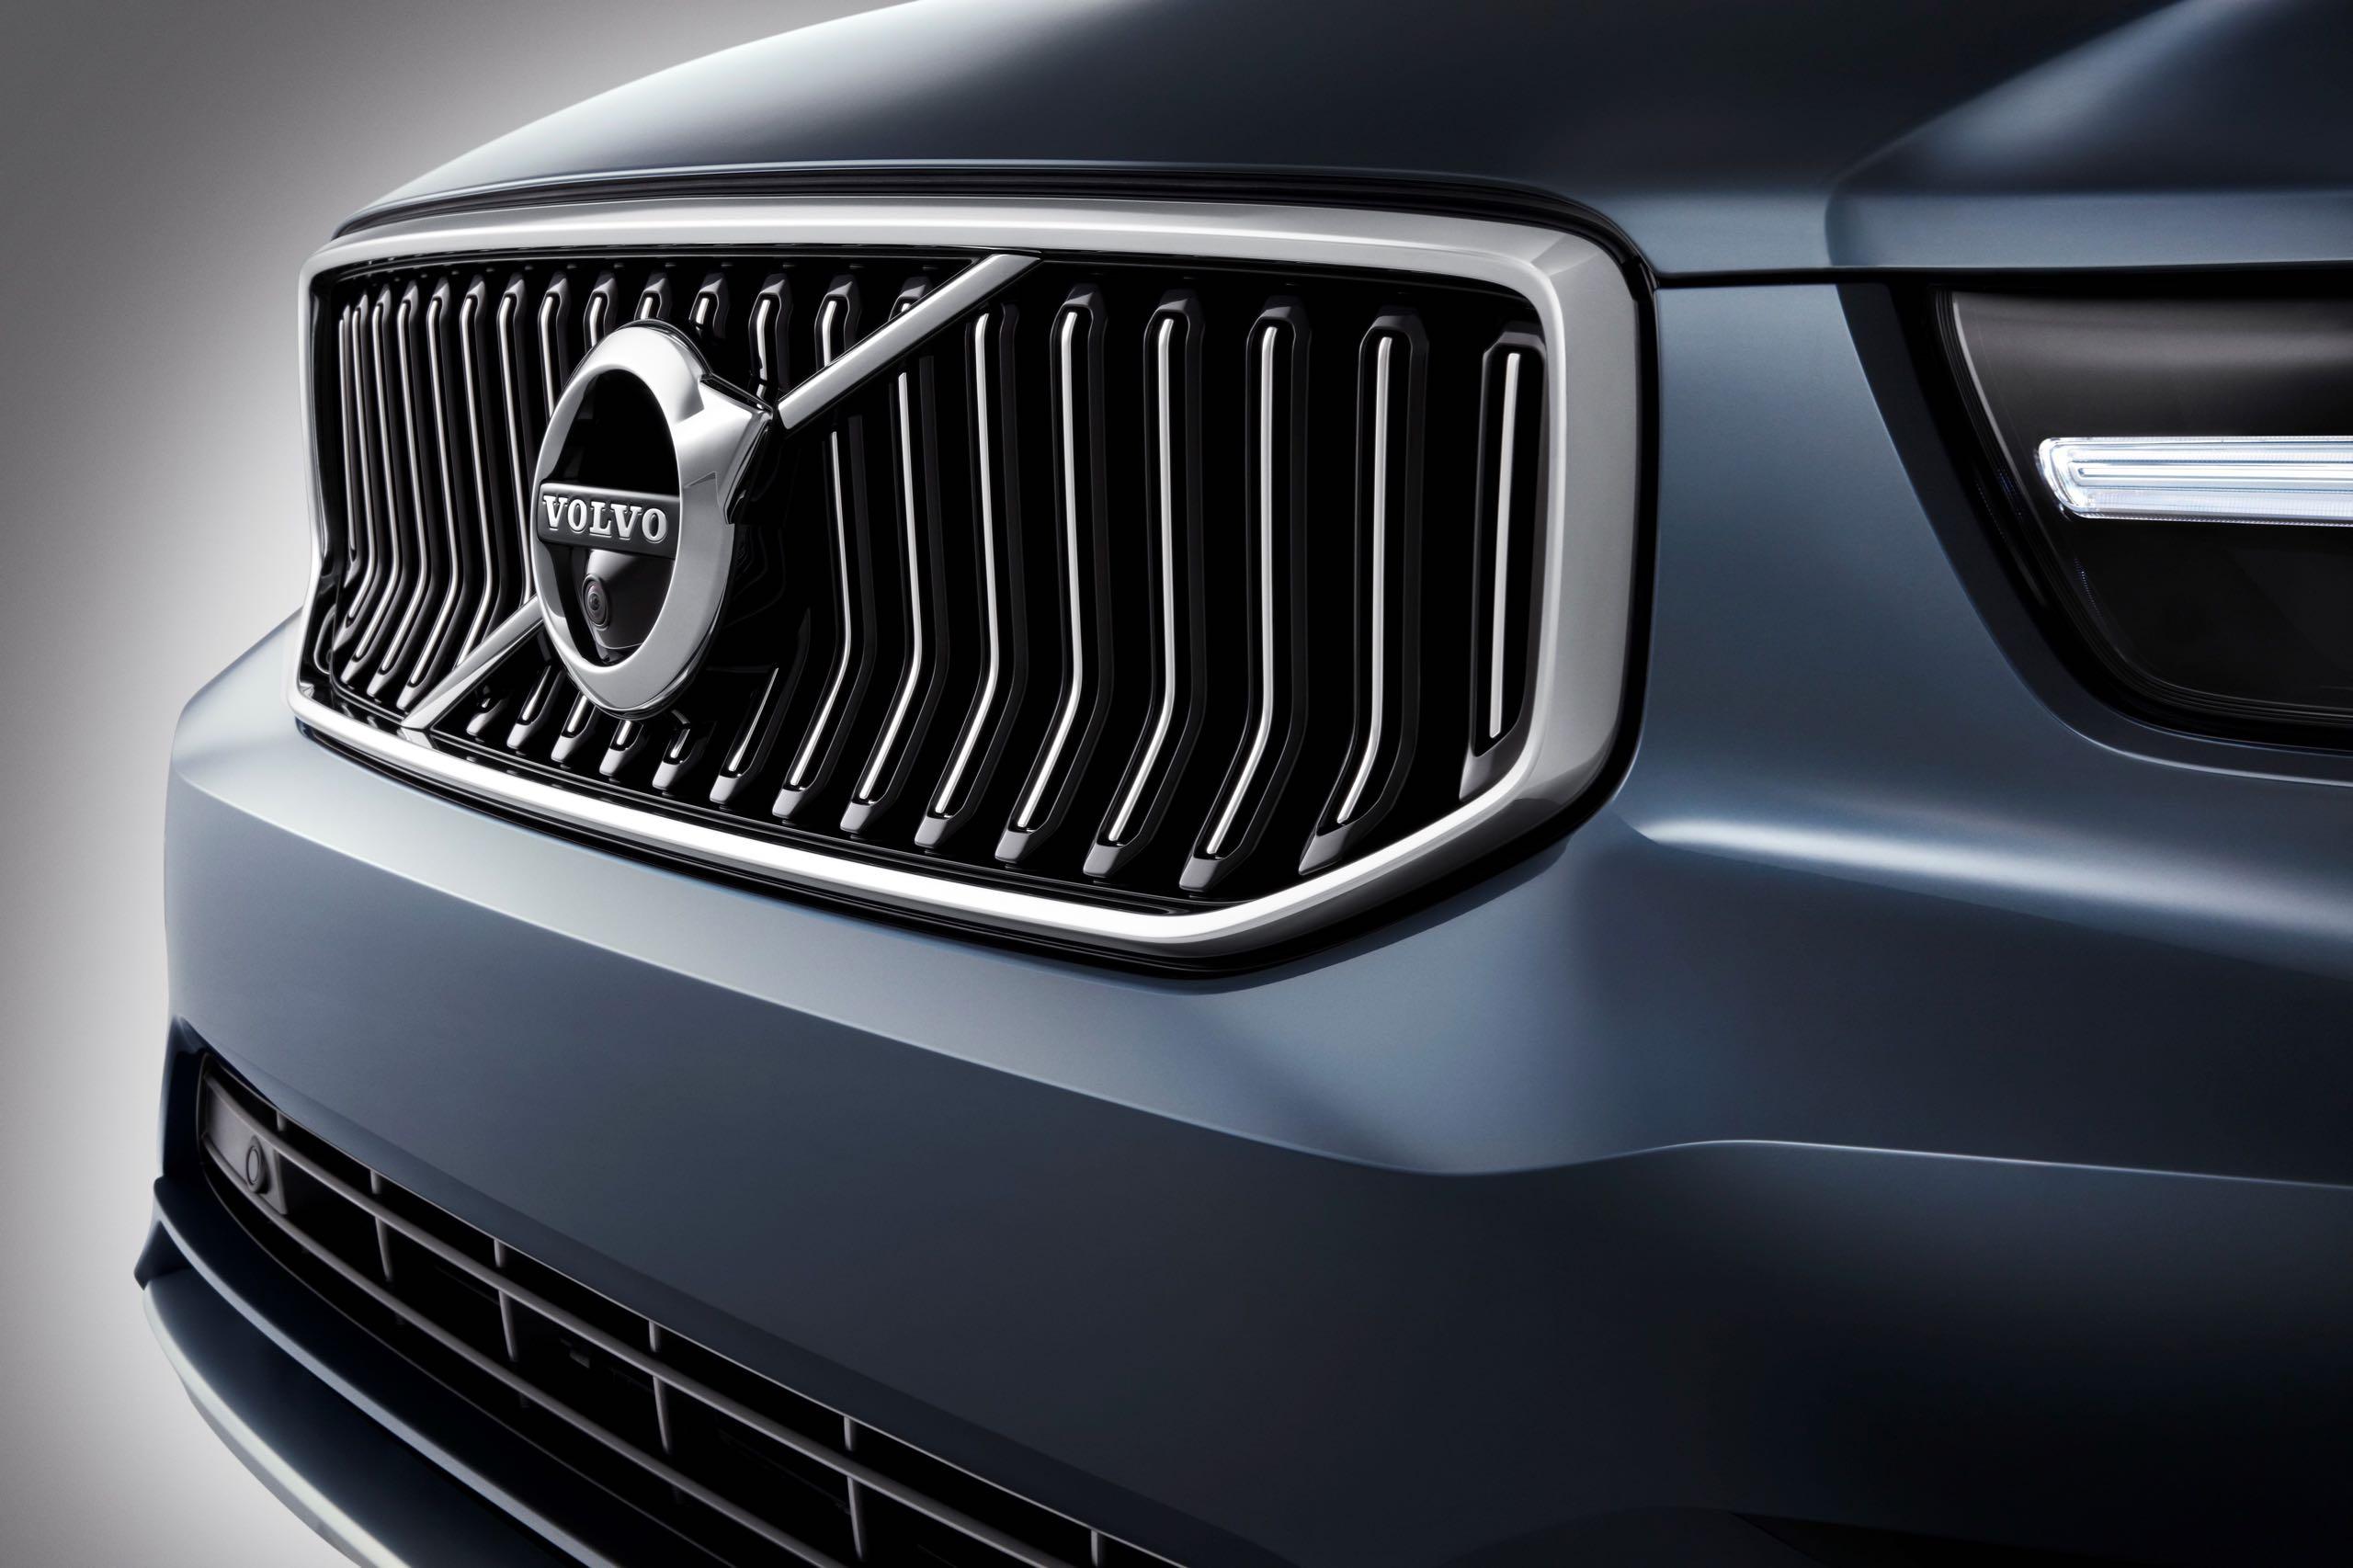 New Volvo XC40 Exterior Detail -  2018, 2018 New XC40, Design, Detail, Exterior, Images, New XC40, Studio